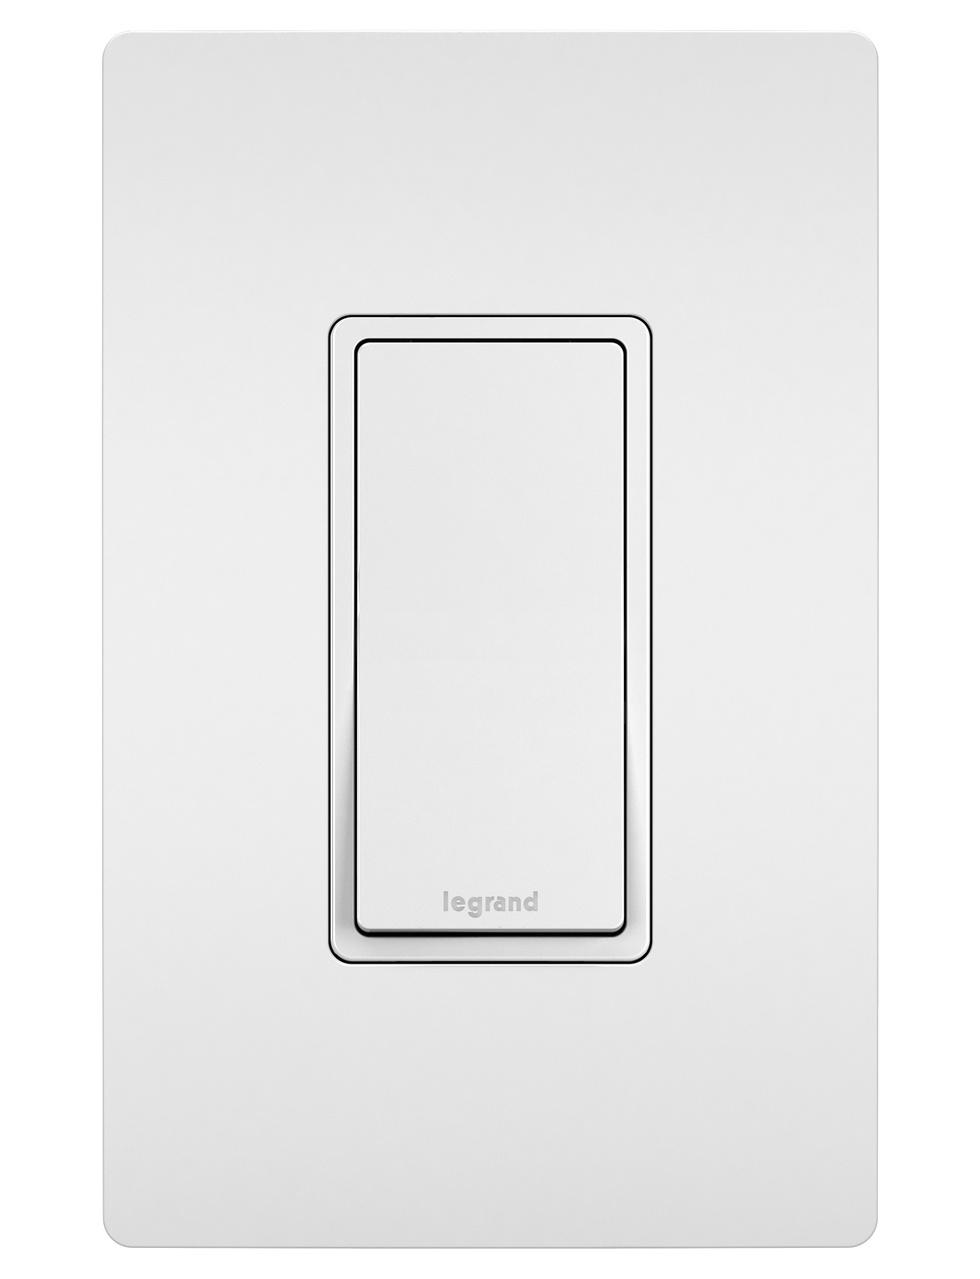 medium resolution of 15a 3 way switch white